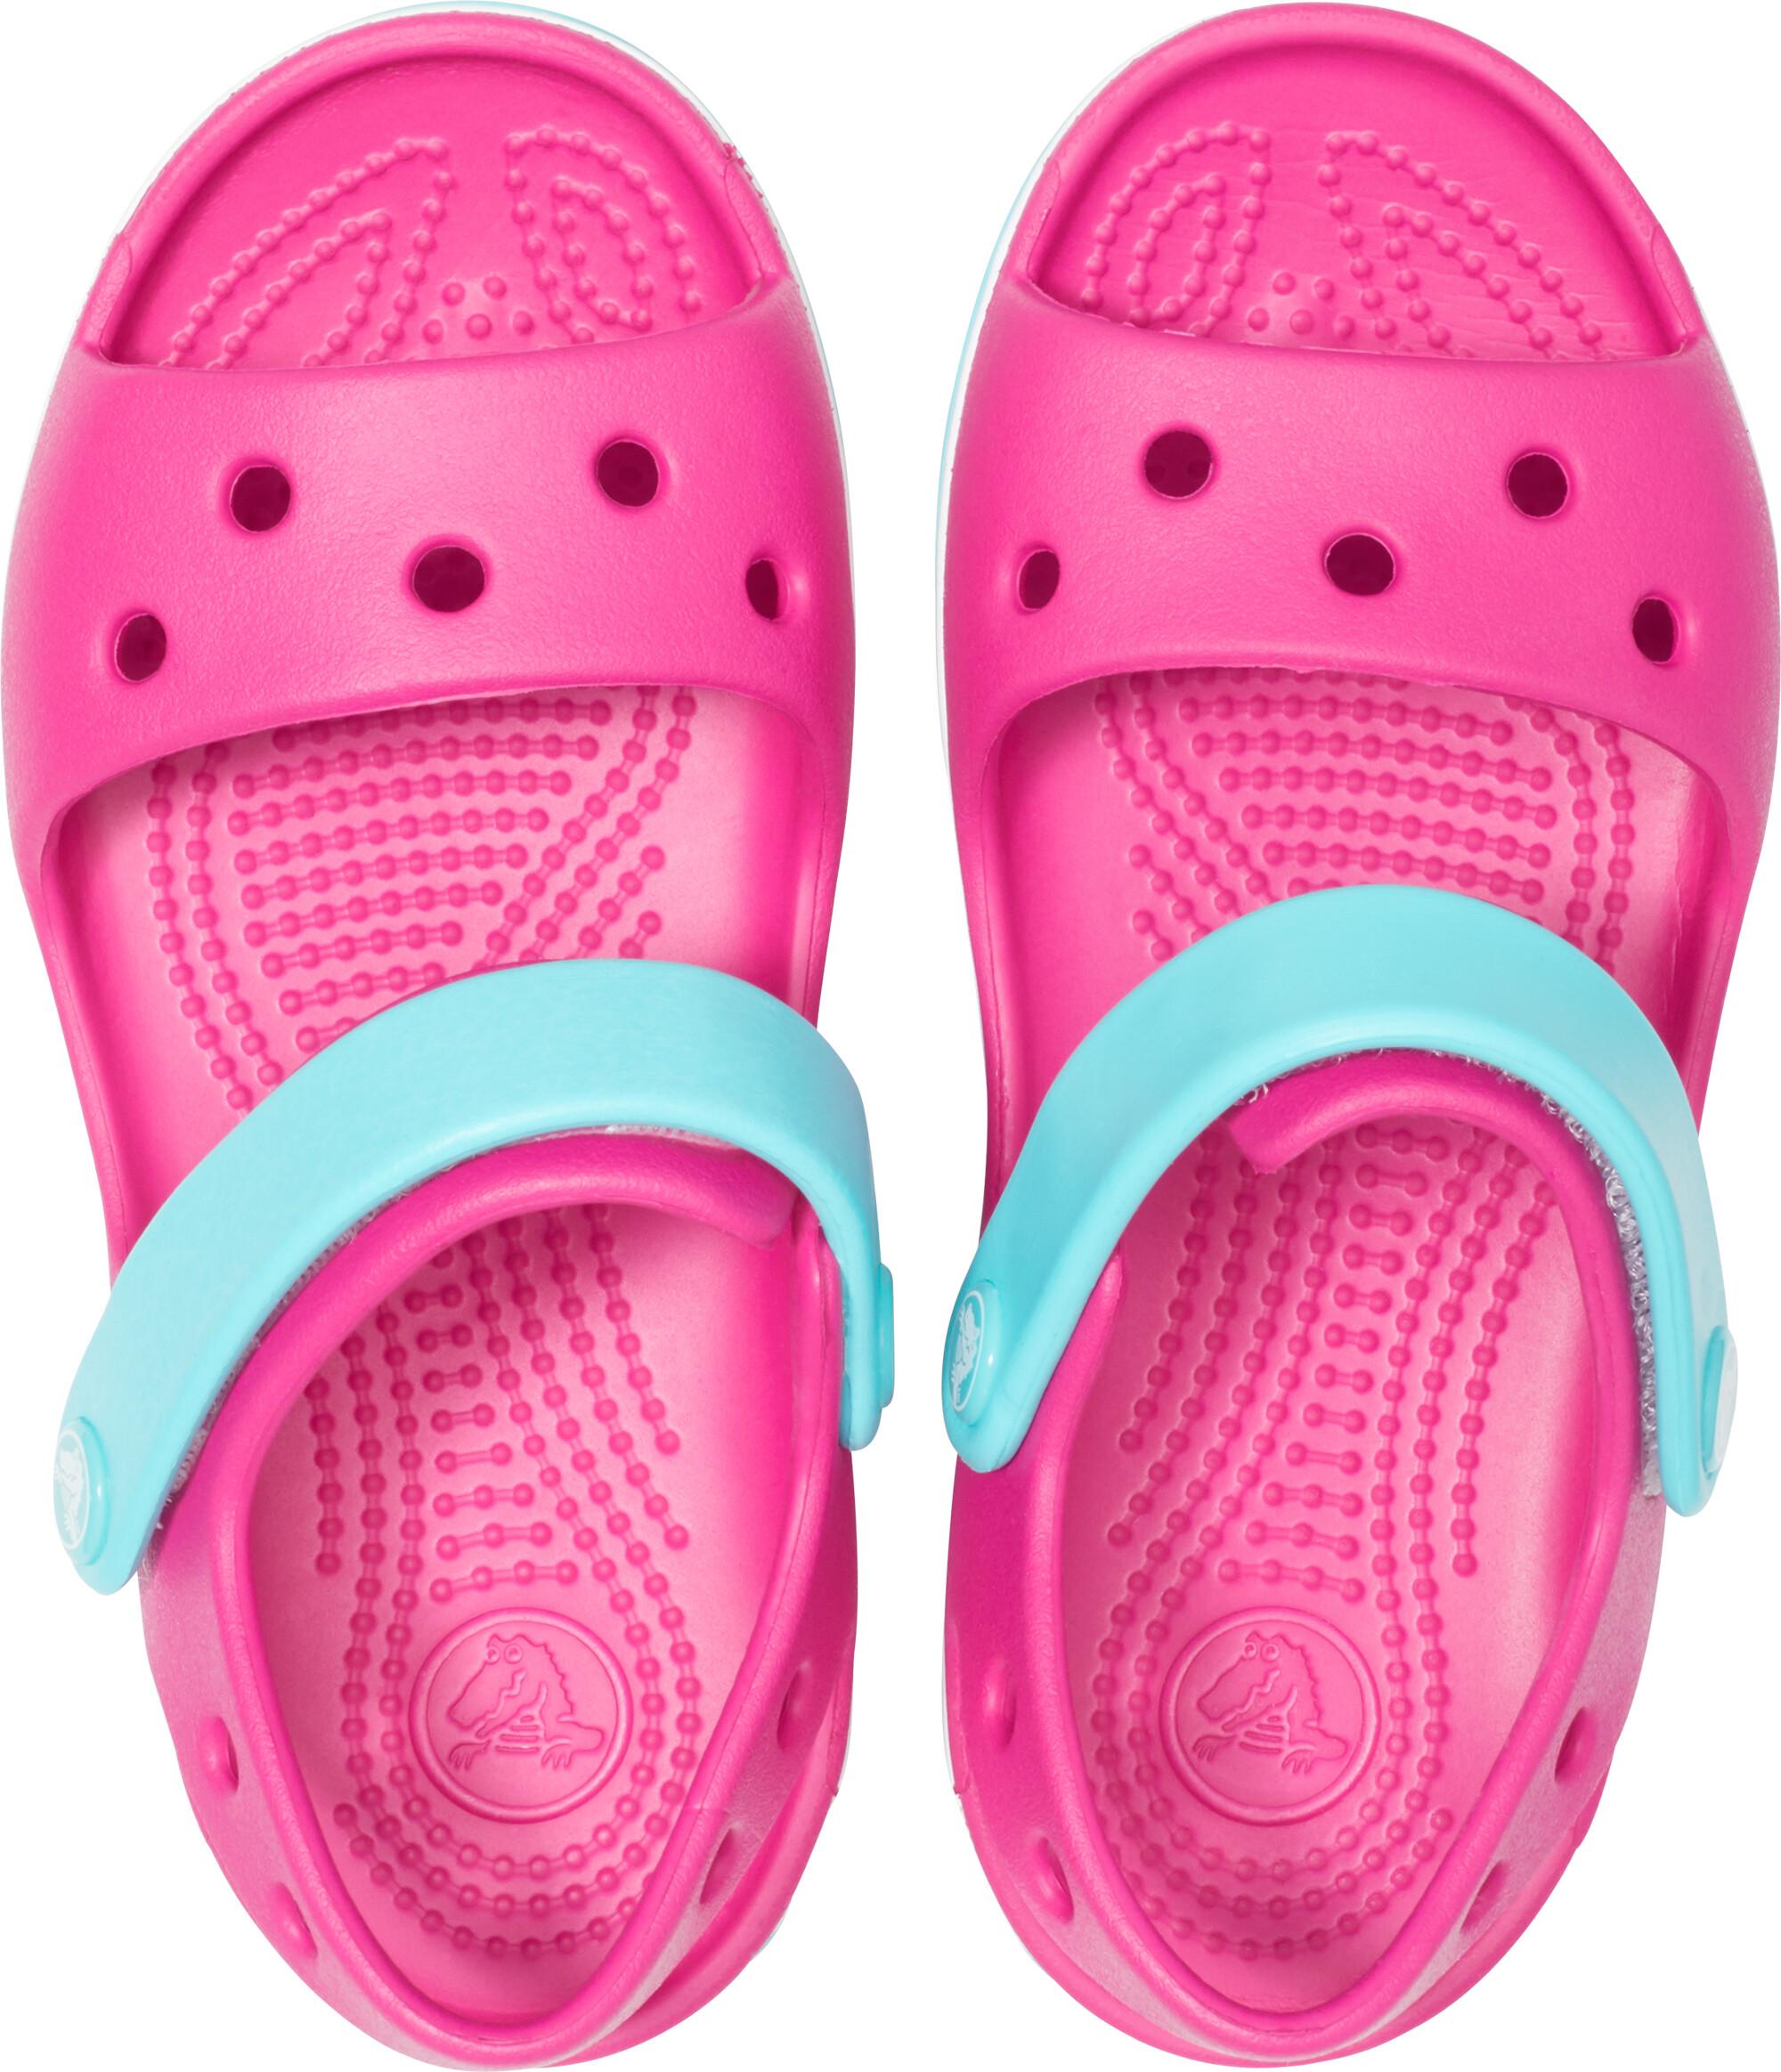 fb16a3cfcb11 Crocs Crocband Sandals Children pink turquoise at Addnature.co.uk